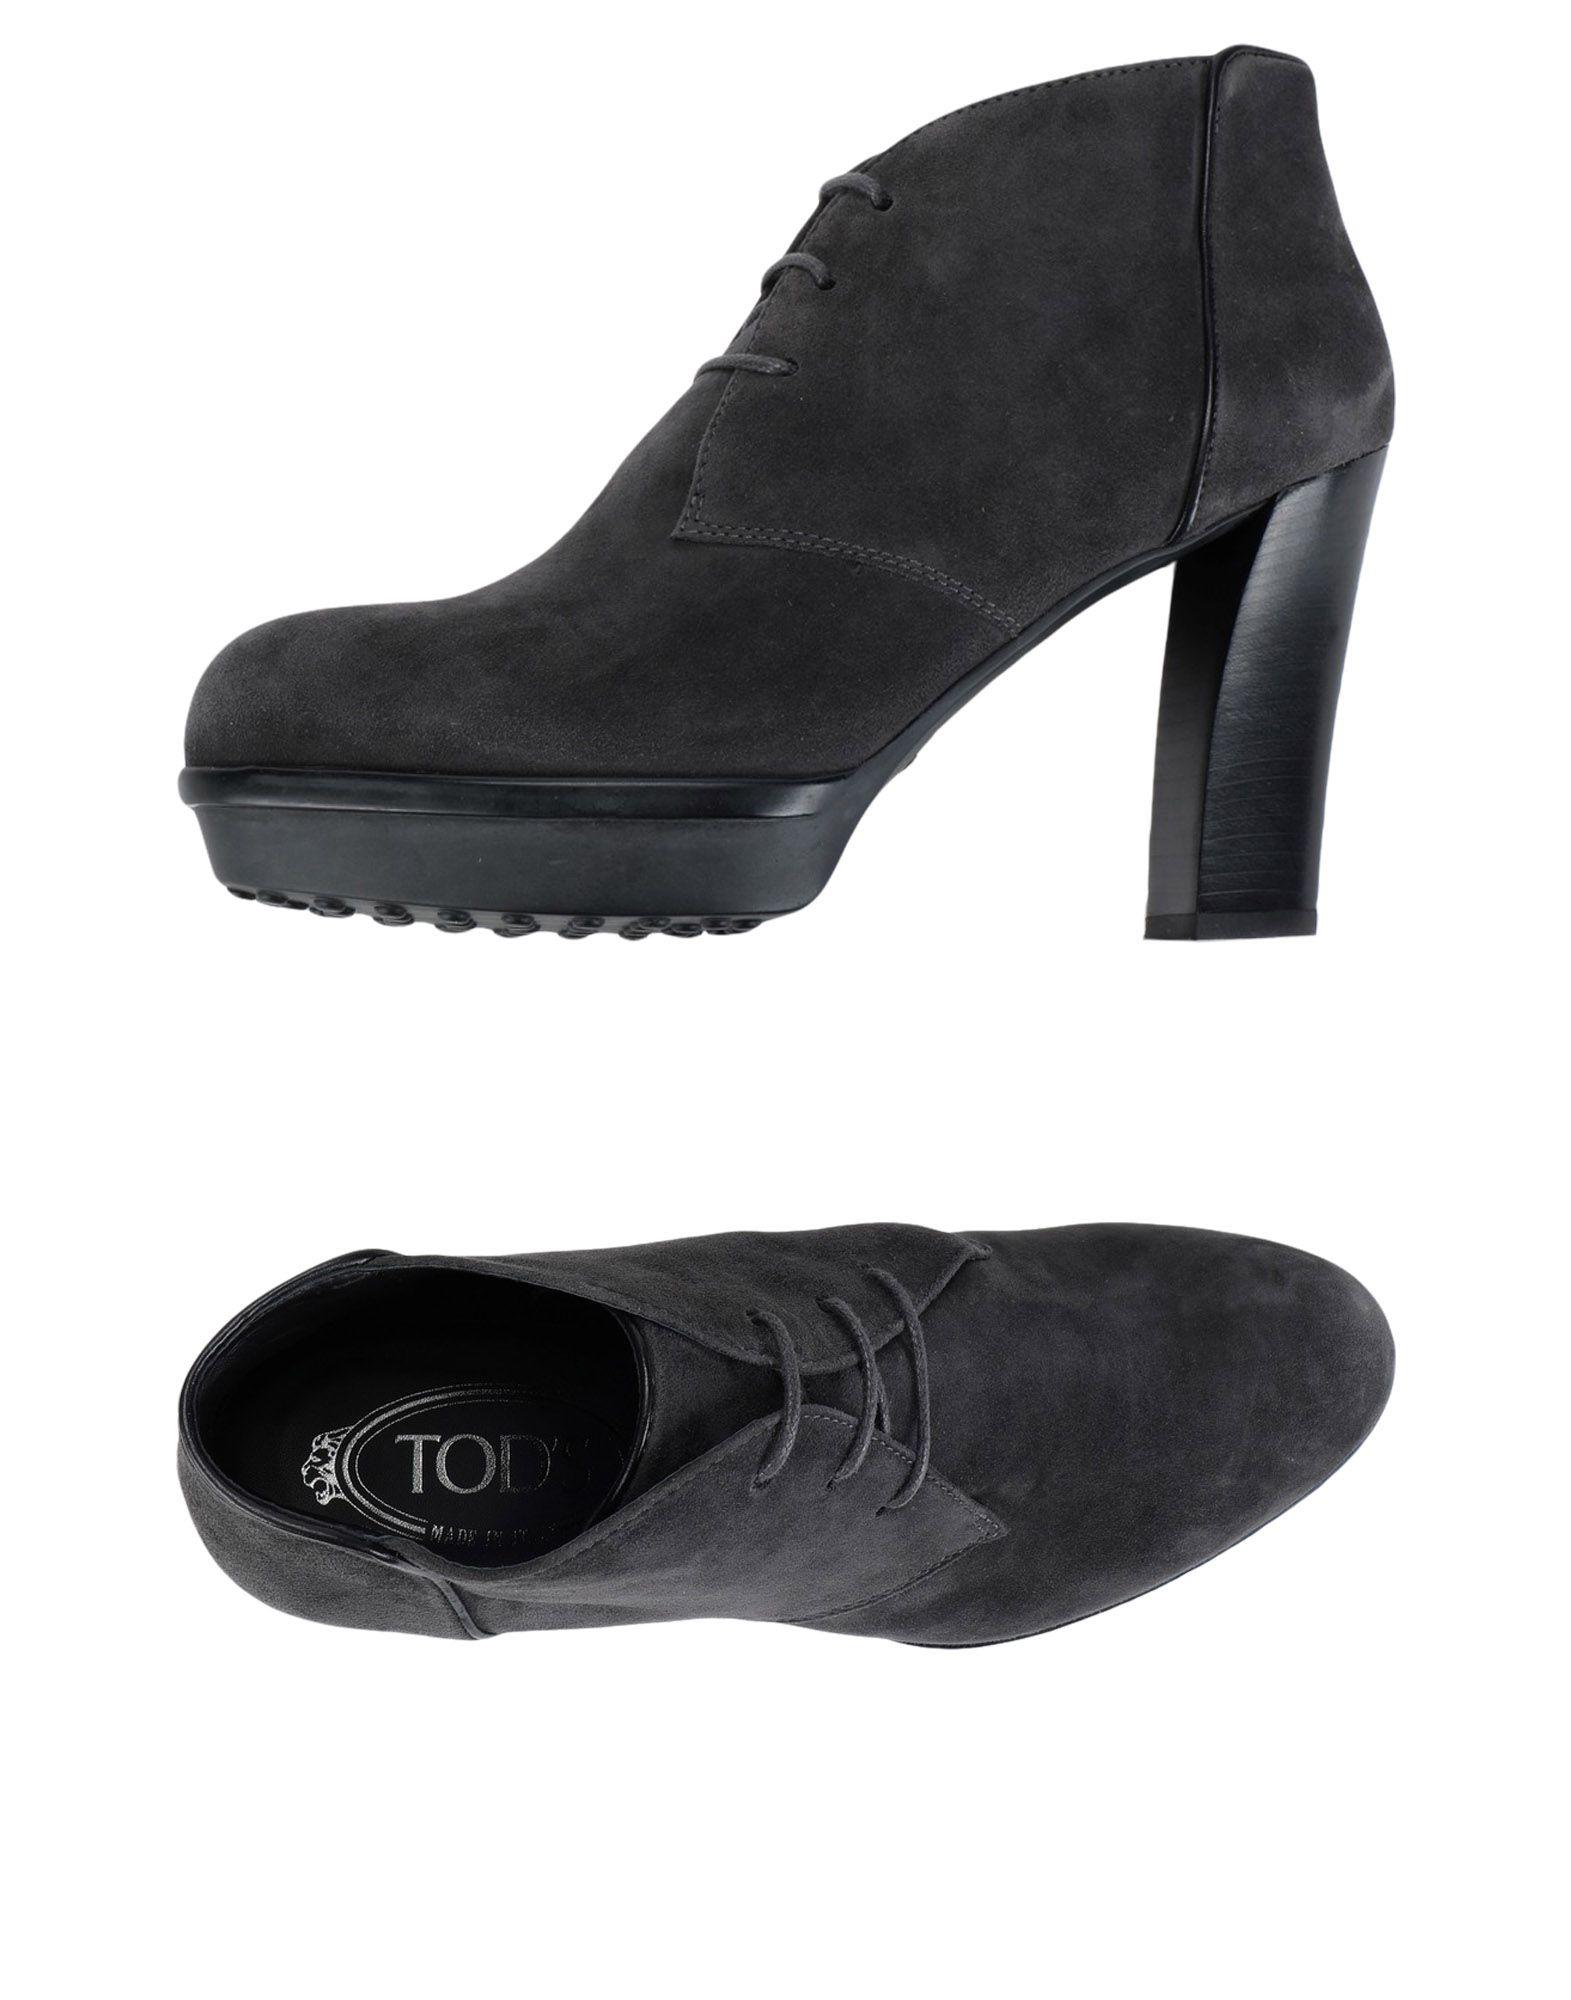 ce0544aa1a2 Παπούτσι Με Κορδόνια Tod's Γυναίκα - Παπούτσια Με Κορδόνια Tod's στο YOOX -  11033962OX